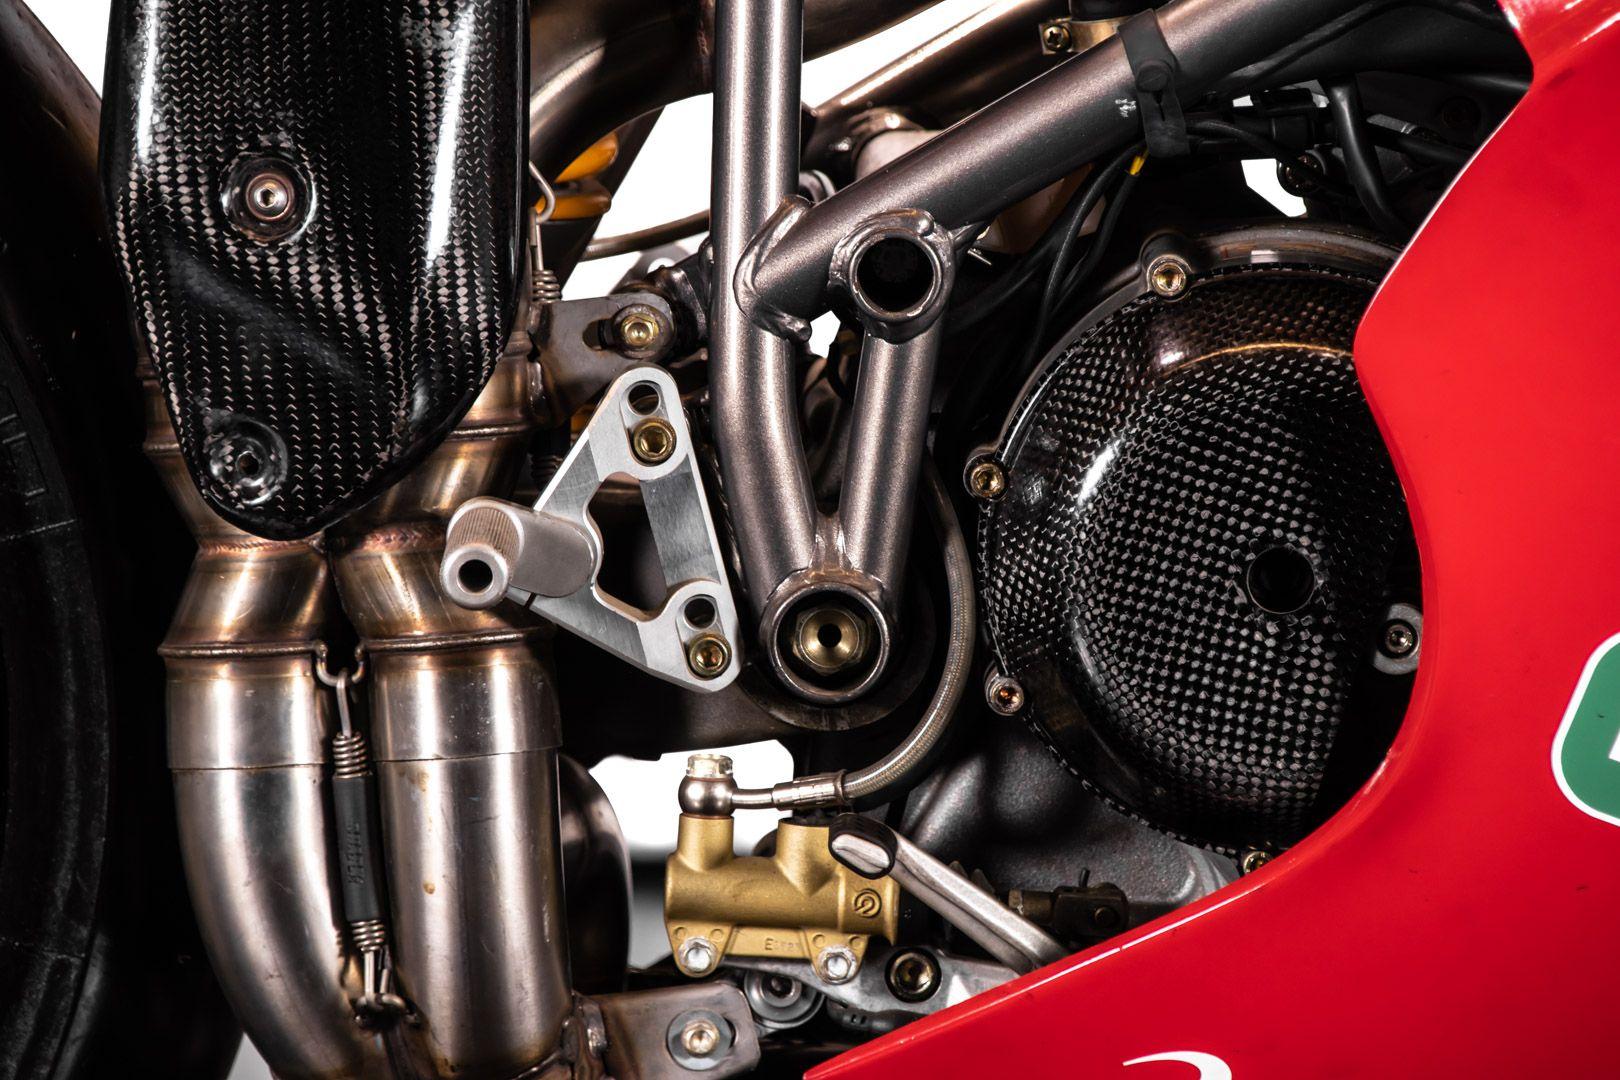 2008 Ducati 996 Fogarty Evocation 03/12 84225